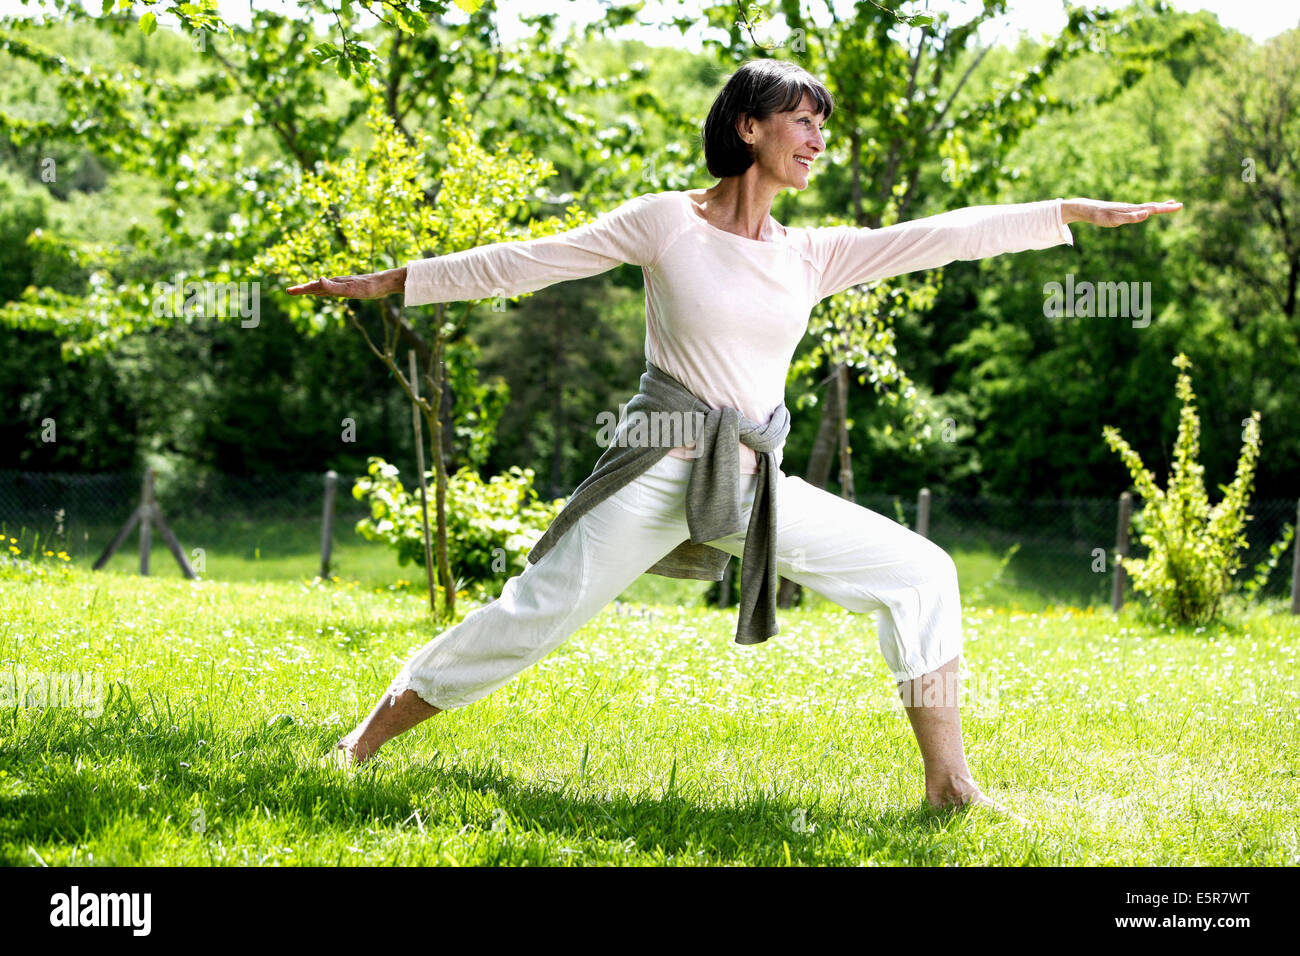 Woman practicing Tai chi. - Stock Image